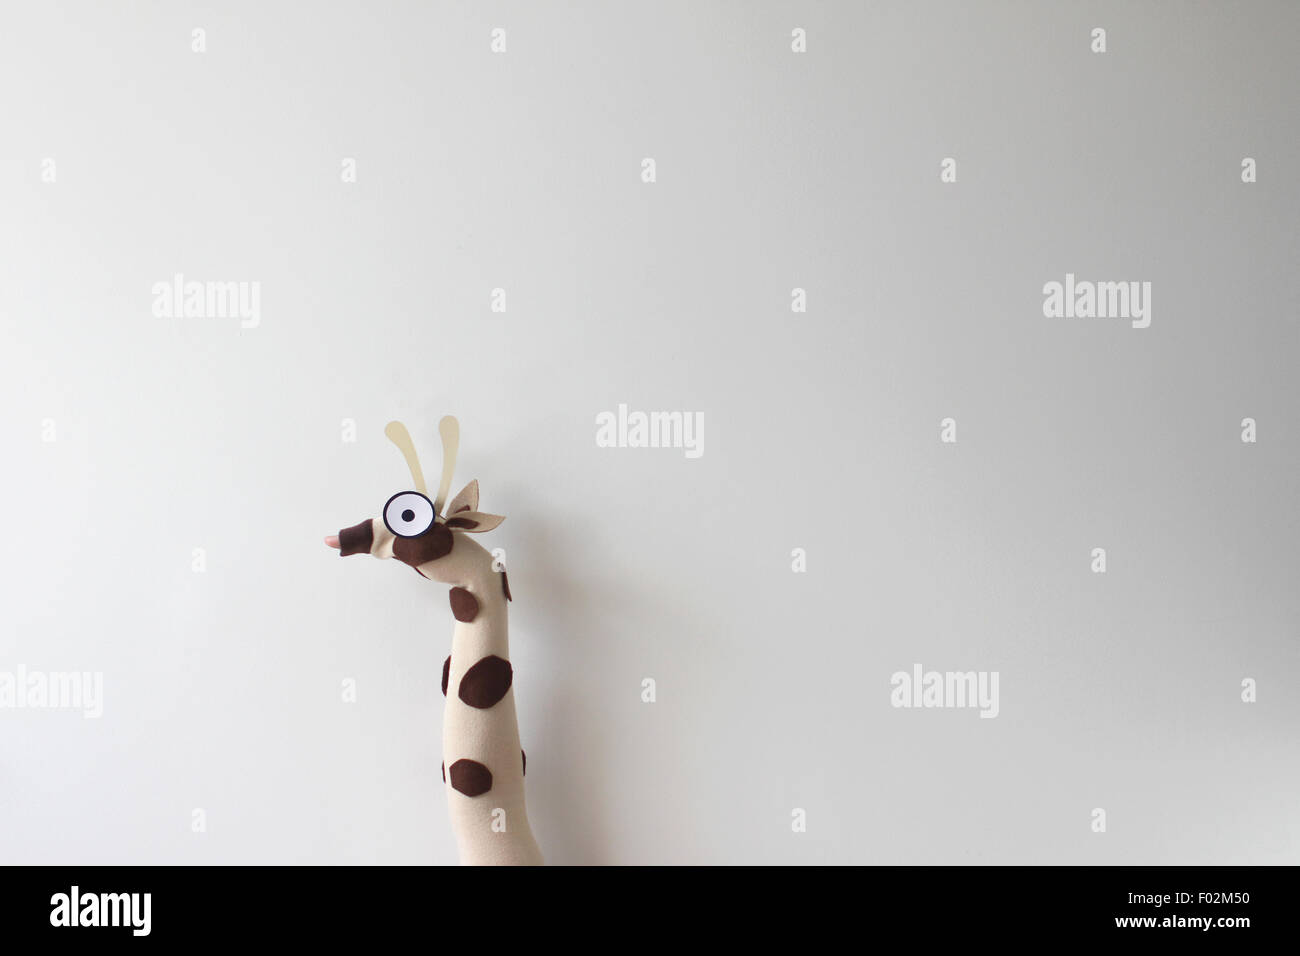 Giraffe hand puppet - Stock Image